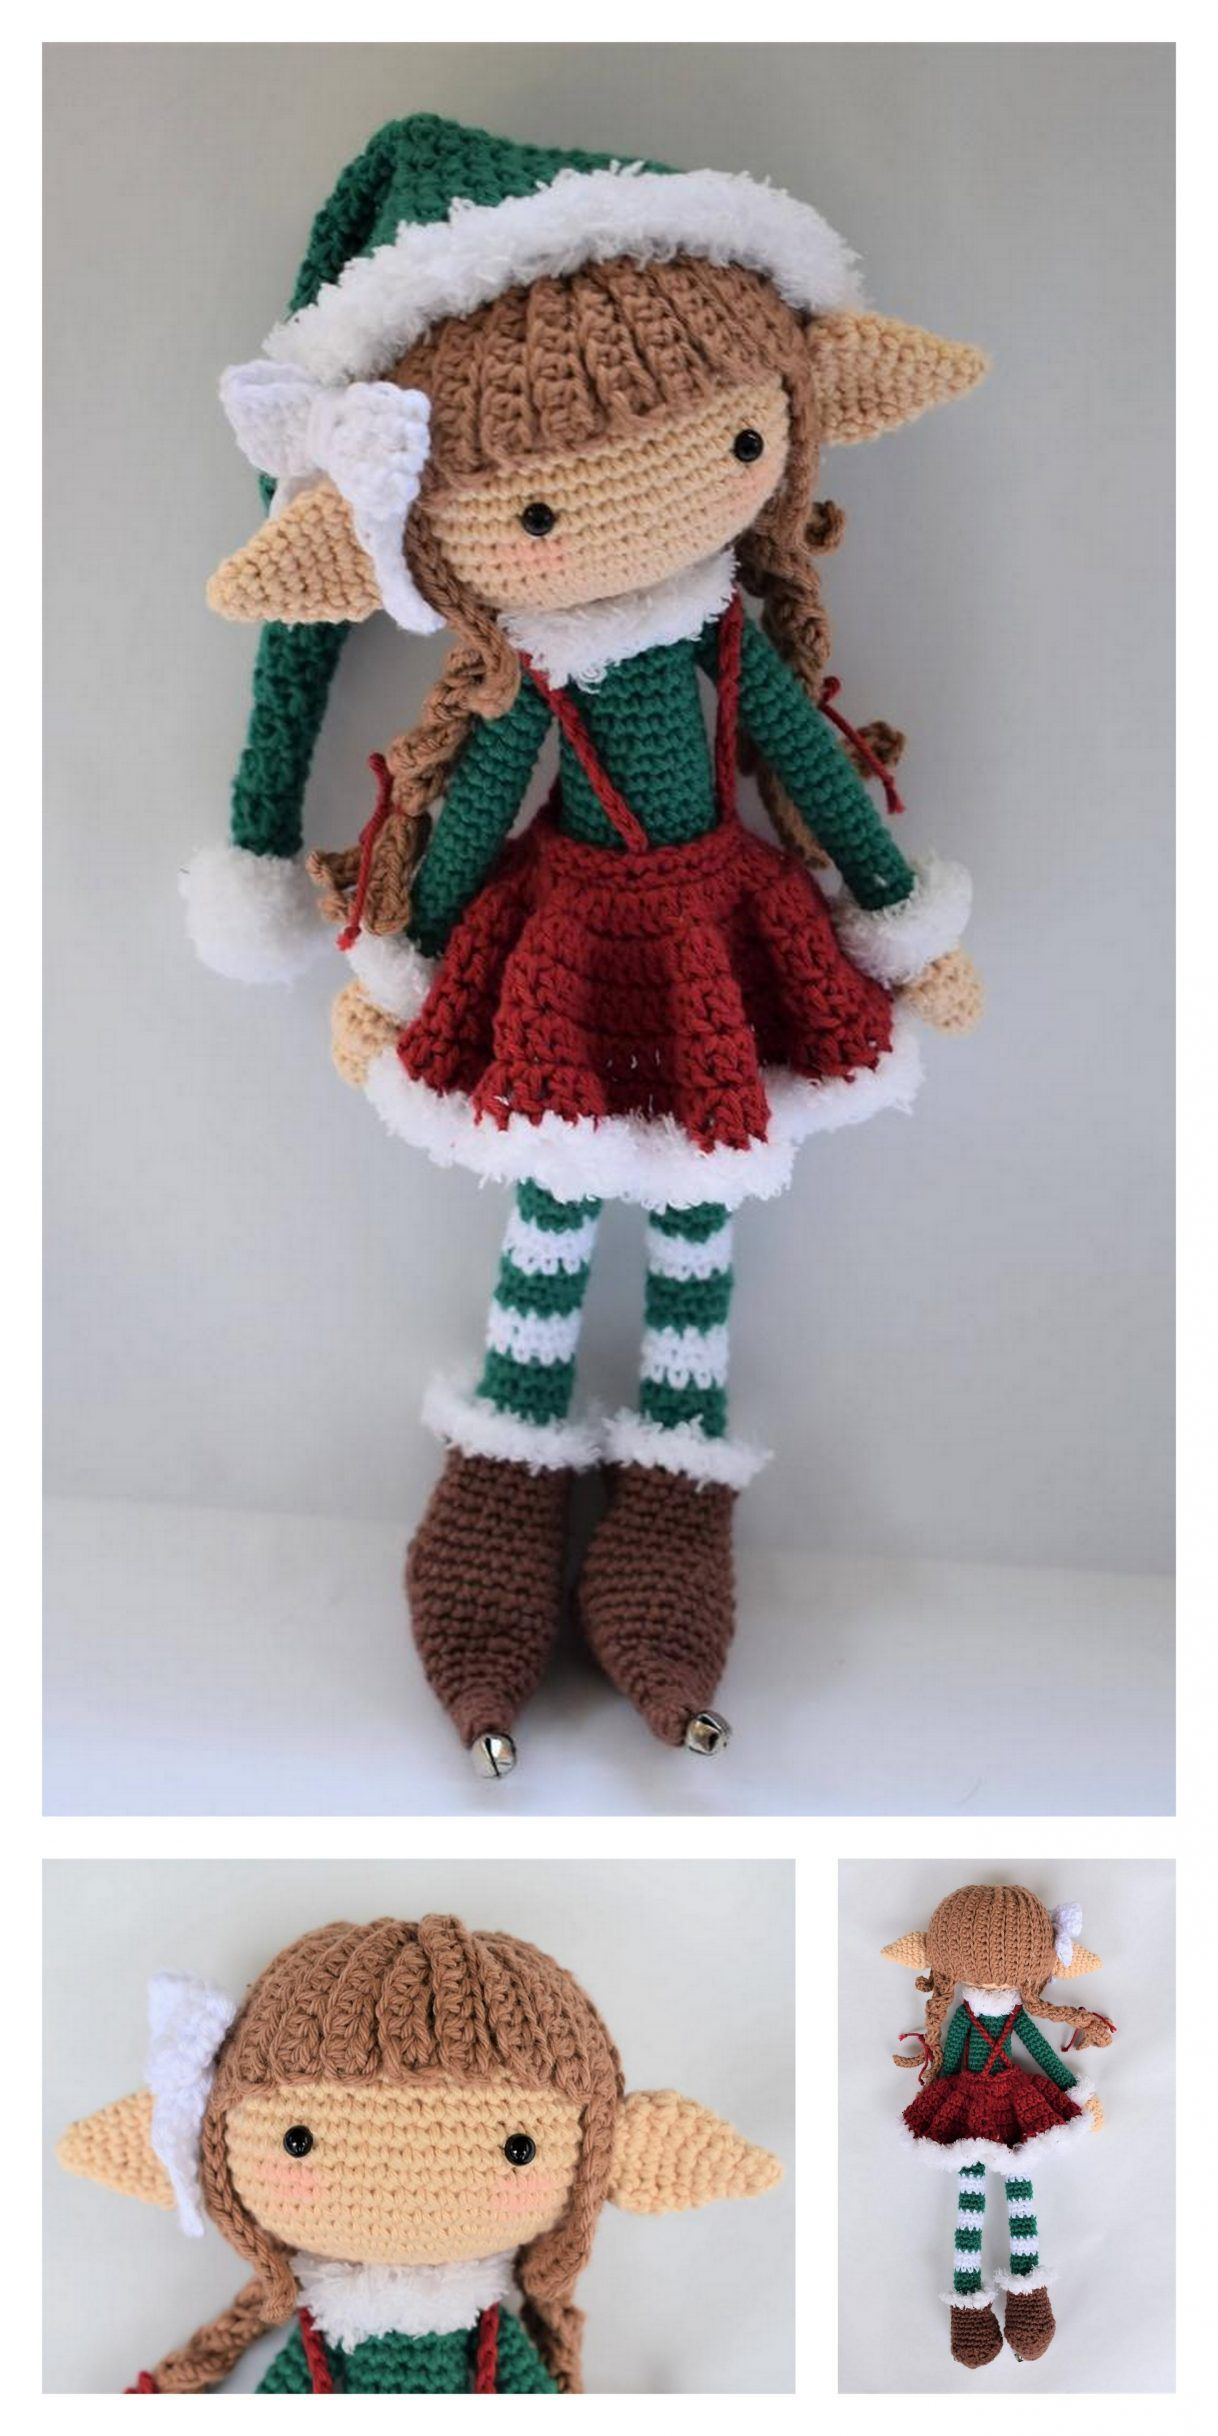 Christmas elf boy amigurumi pattern - Amigurumipatterns.net | 2436x1218